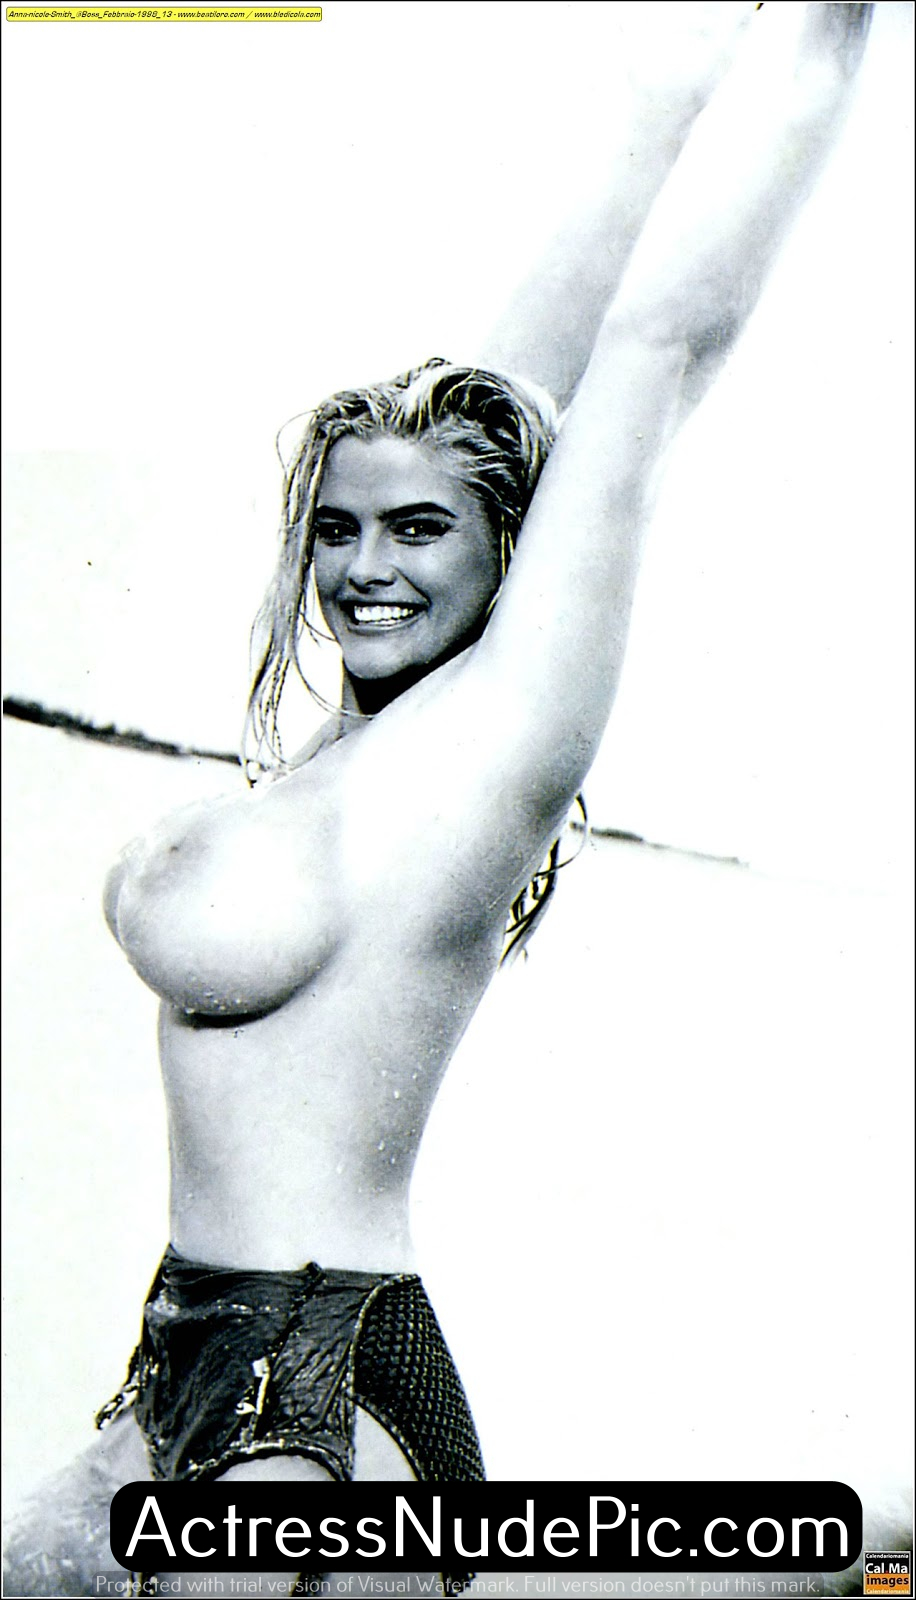 Sheridan Smith nude, Sheridan Smith hot, Sheridan Smith bikini, Sheridan Smith sex, Sheridan Smith xxx, Sheridan Smith porn, Sheridan Smith boobs, Sheridan Smith naked, Sheridan Smith ass